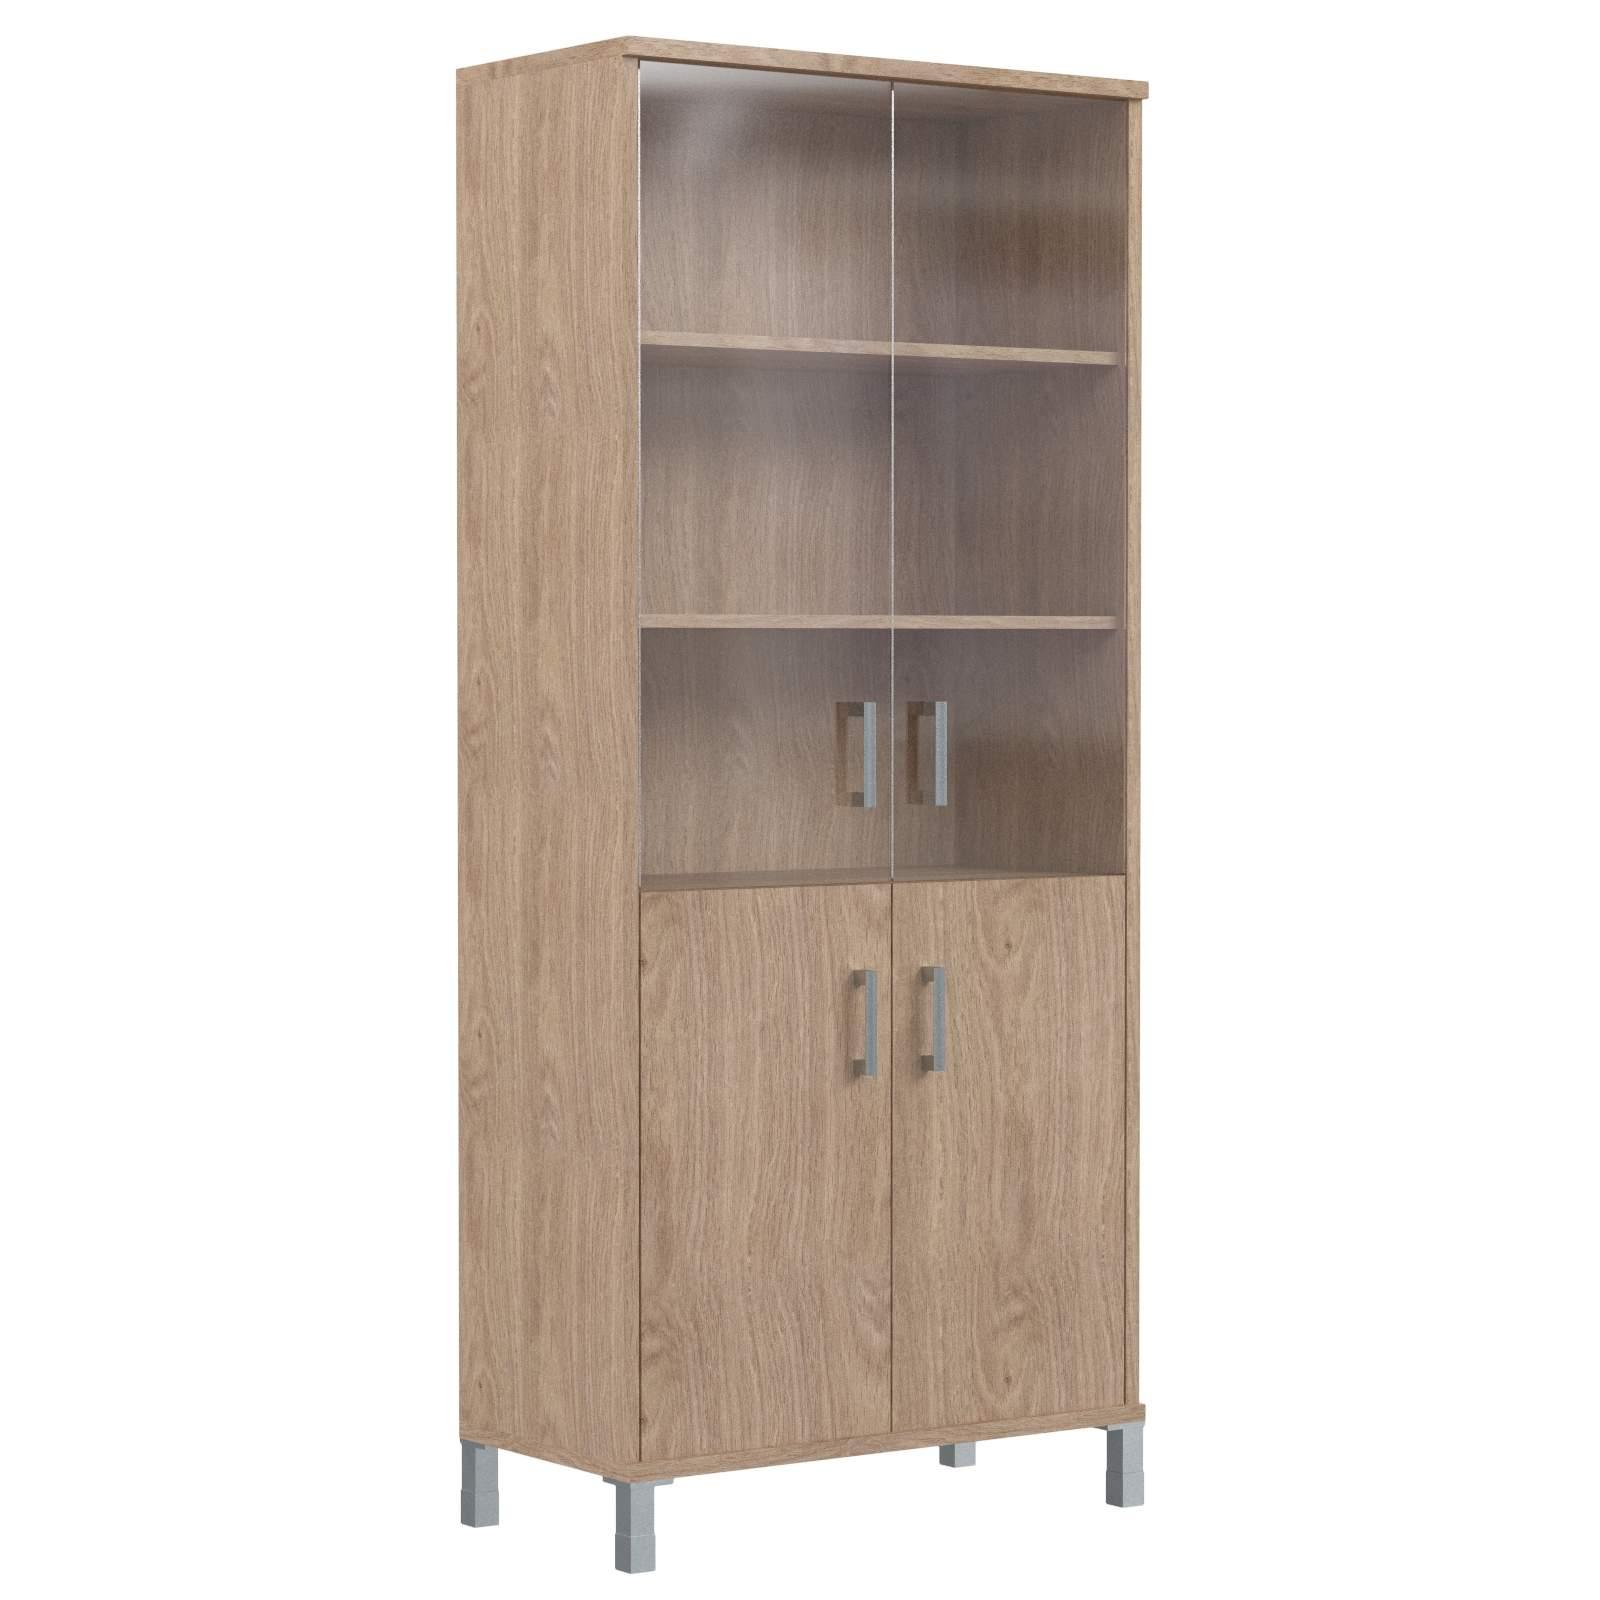 Шкаф комбинированный со стеклом 900х435х2004